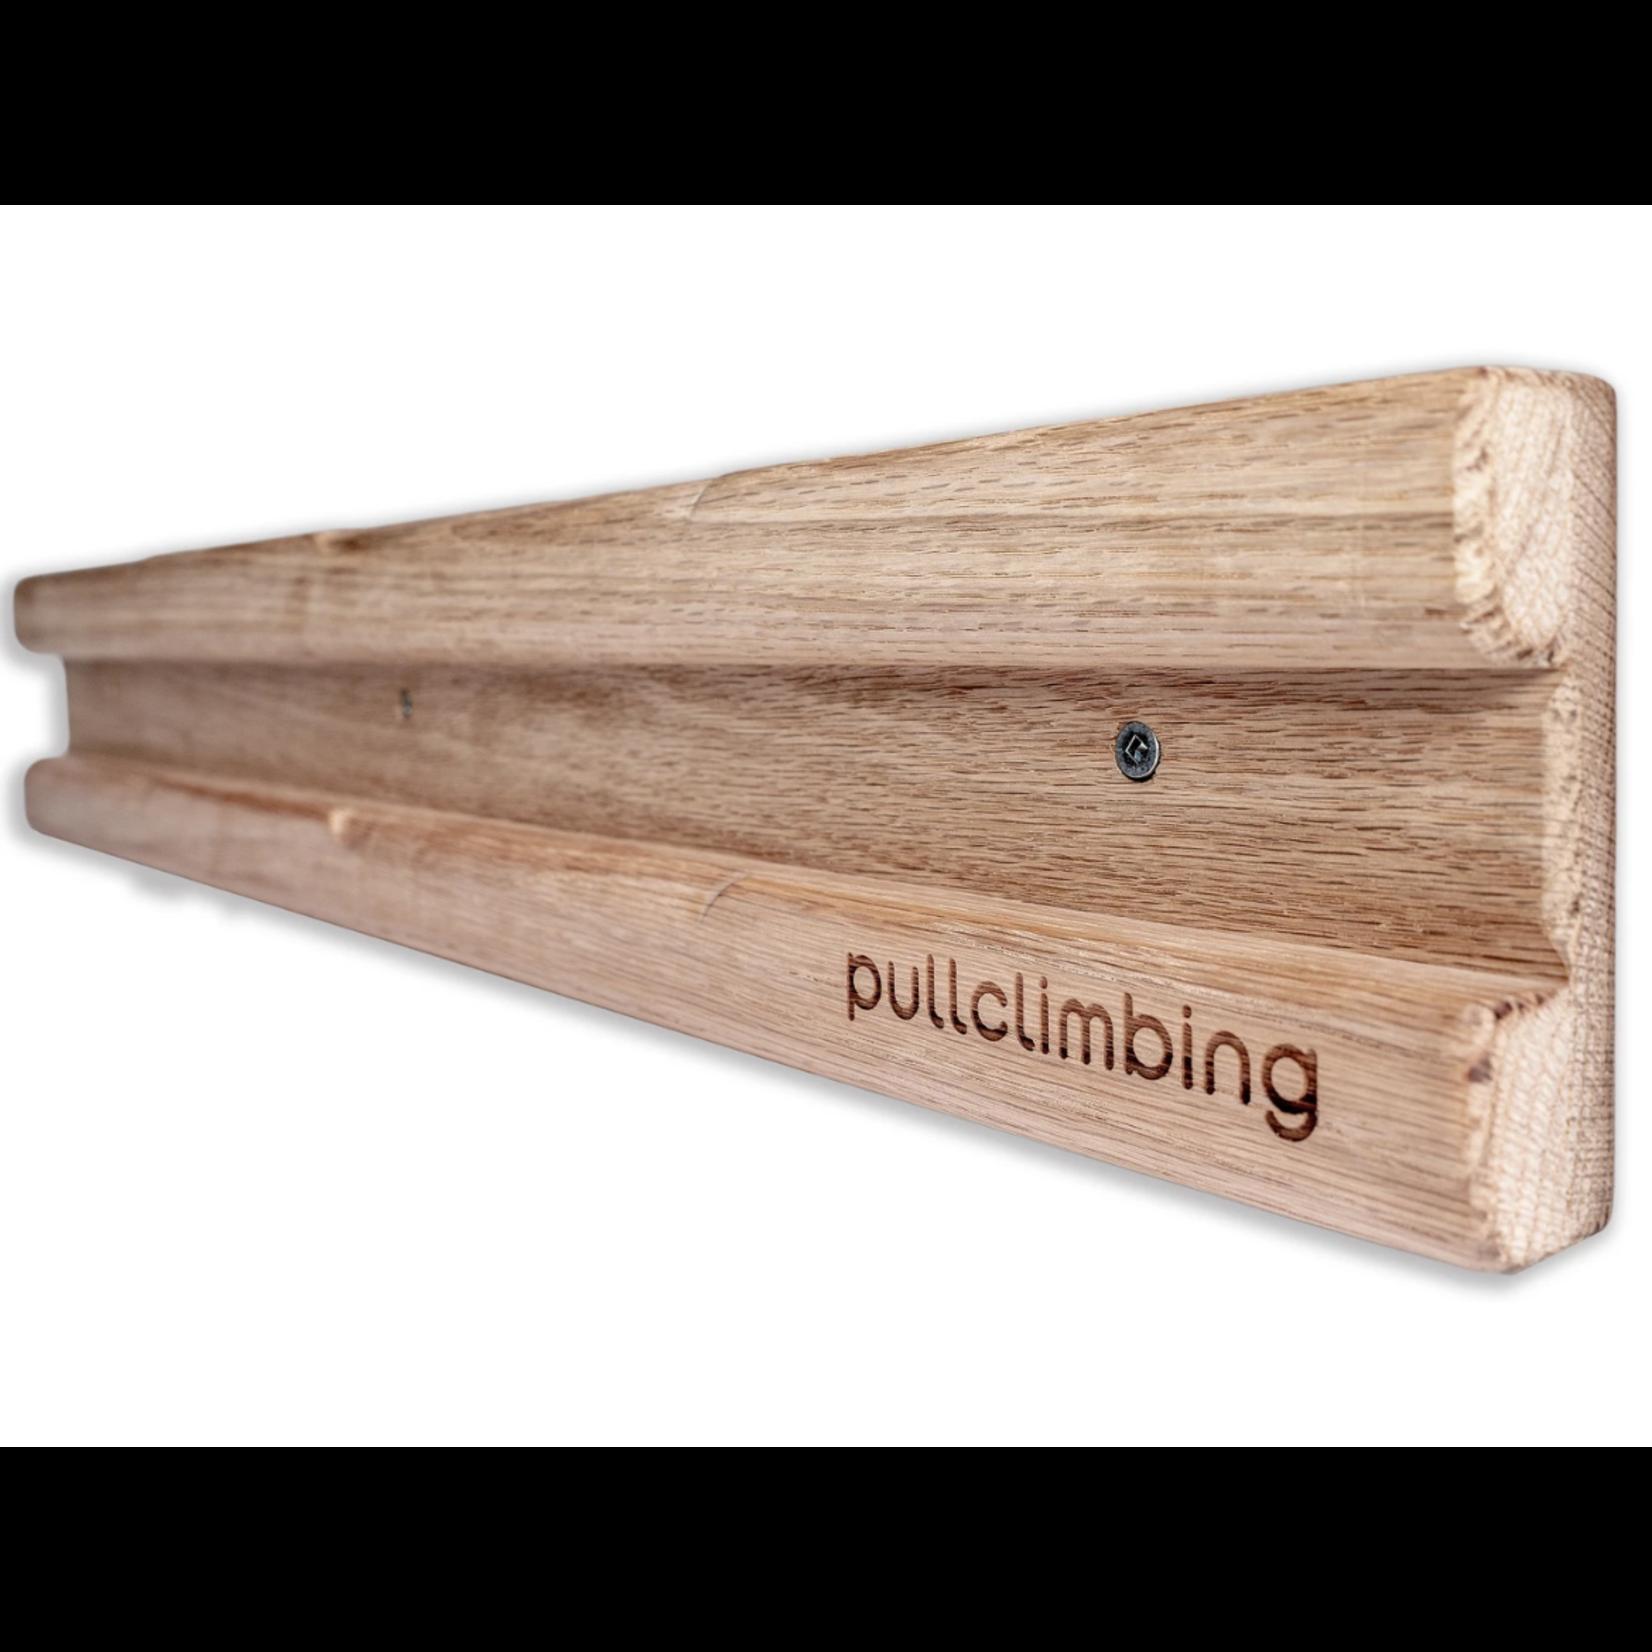 Pull Climbing Pullboard 0.5